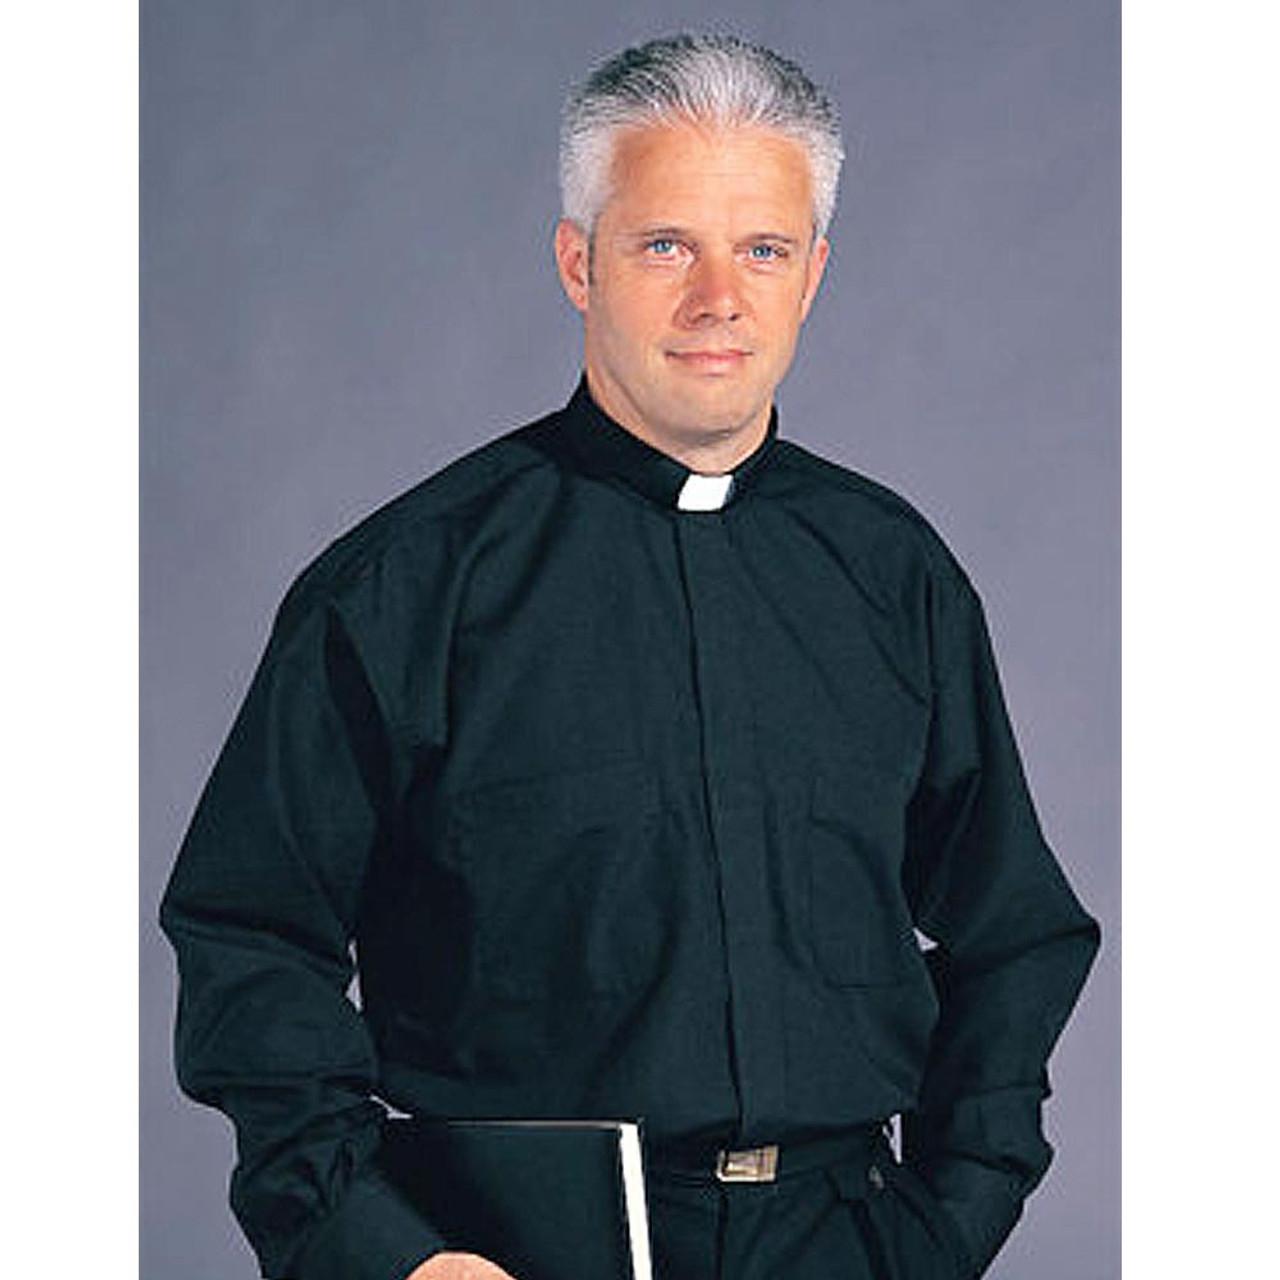 Stadelmaier/Slabbinck Long Sleeve Black Tab Collar Clergy Shirt